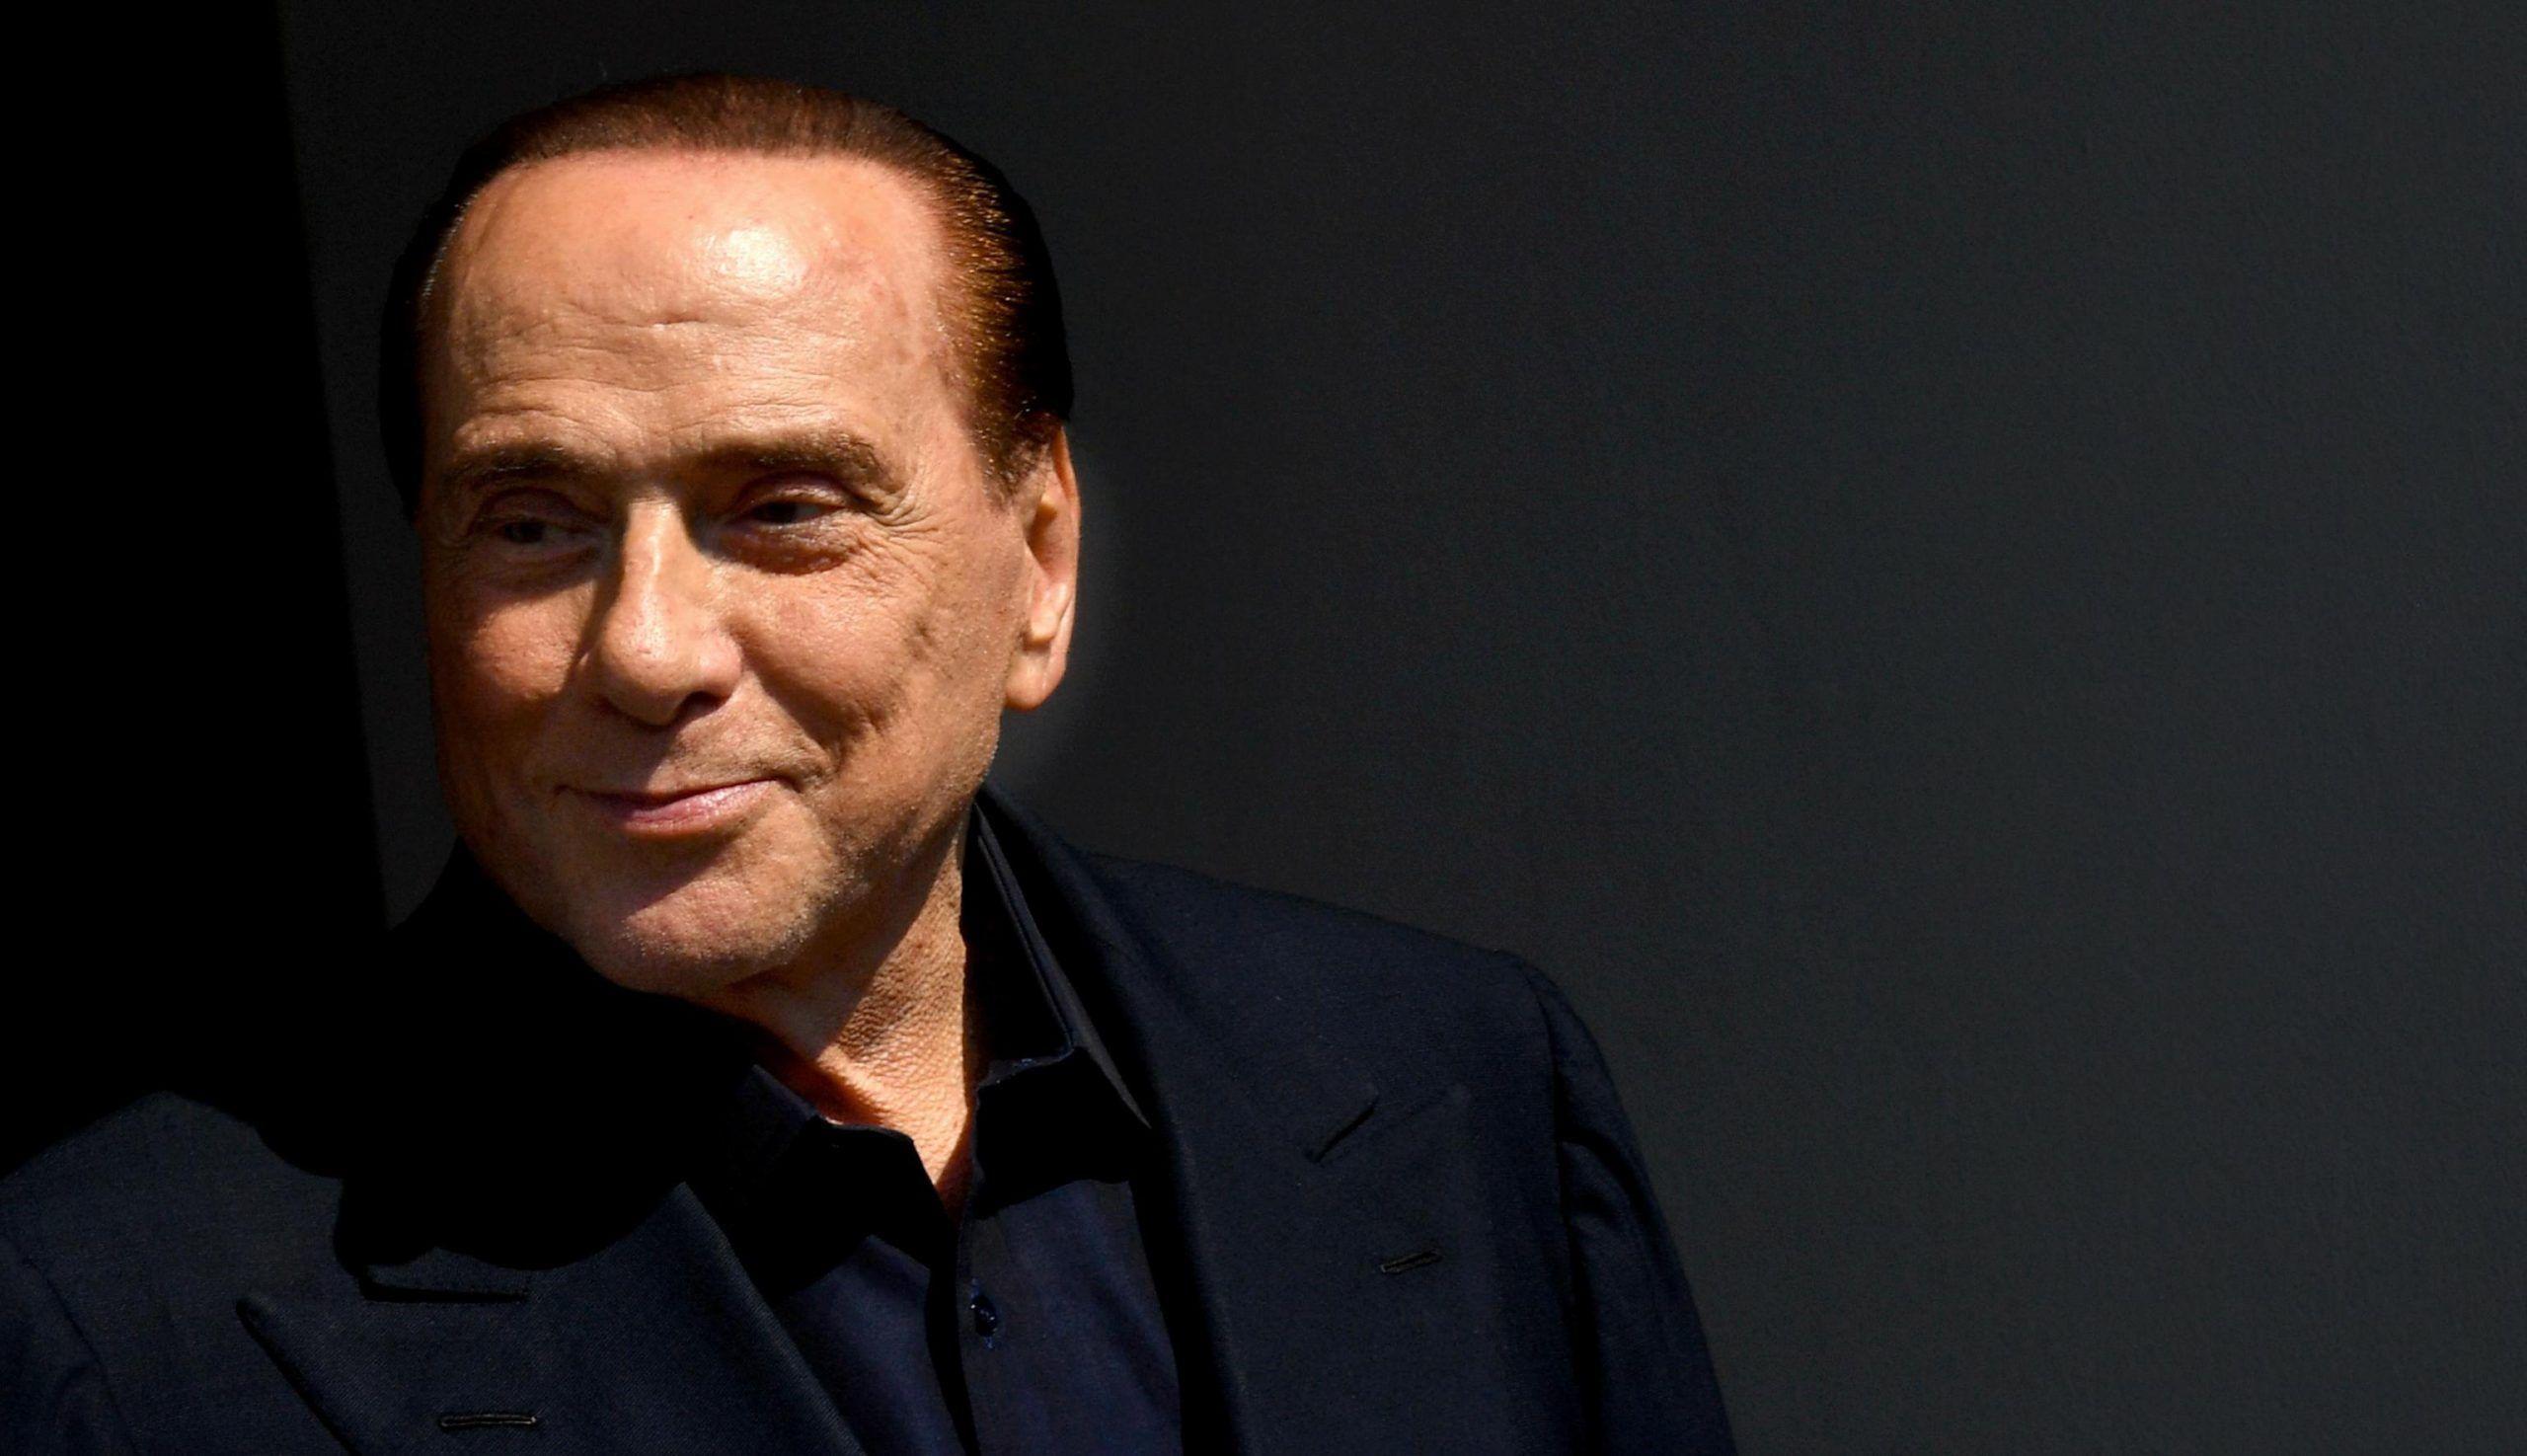 Berlusconi lascia ospedale San Raffaele dopo controlli